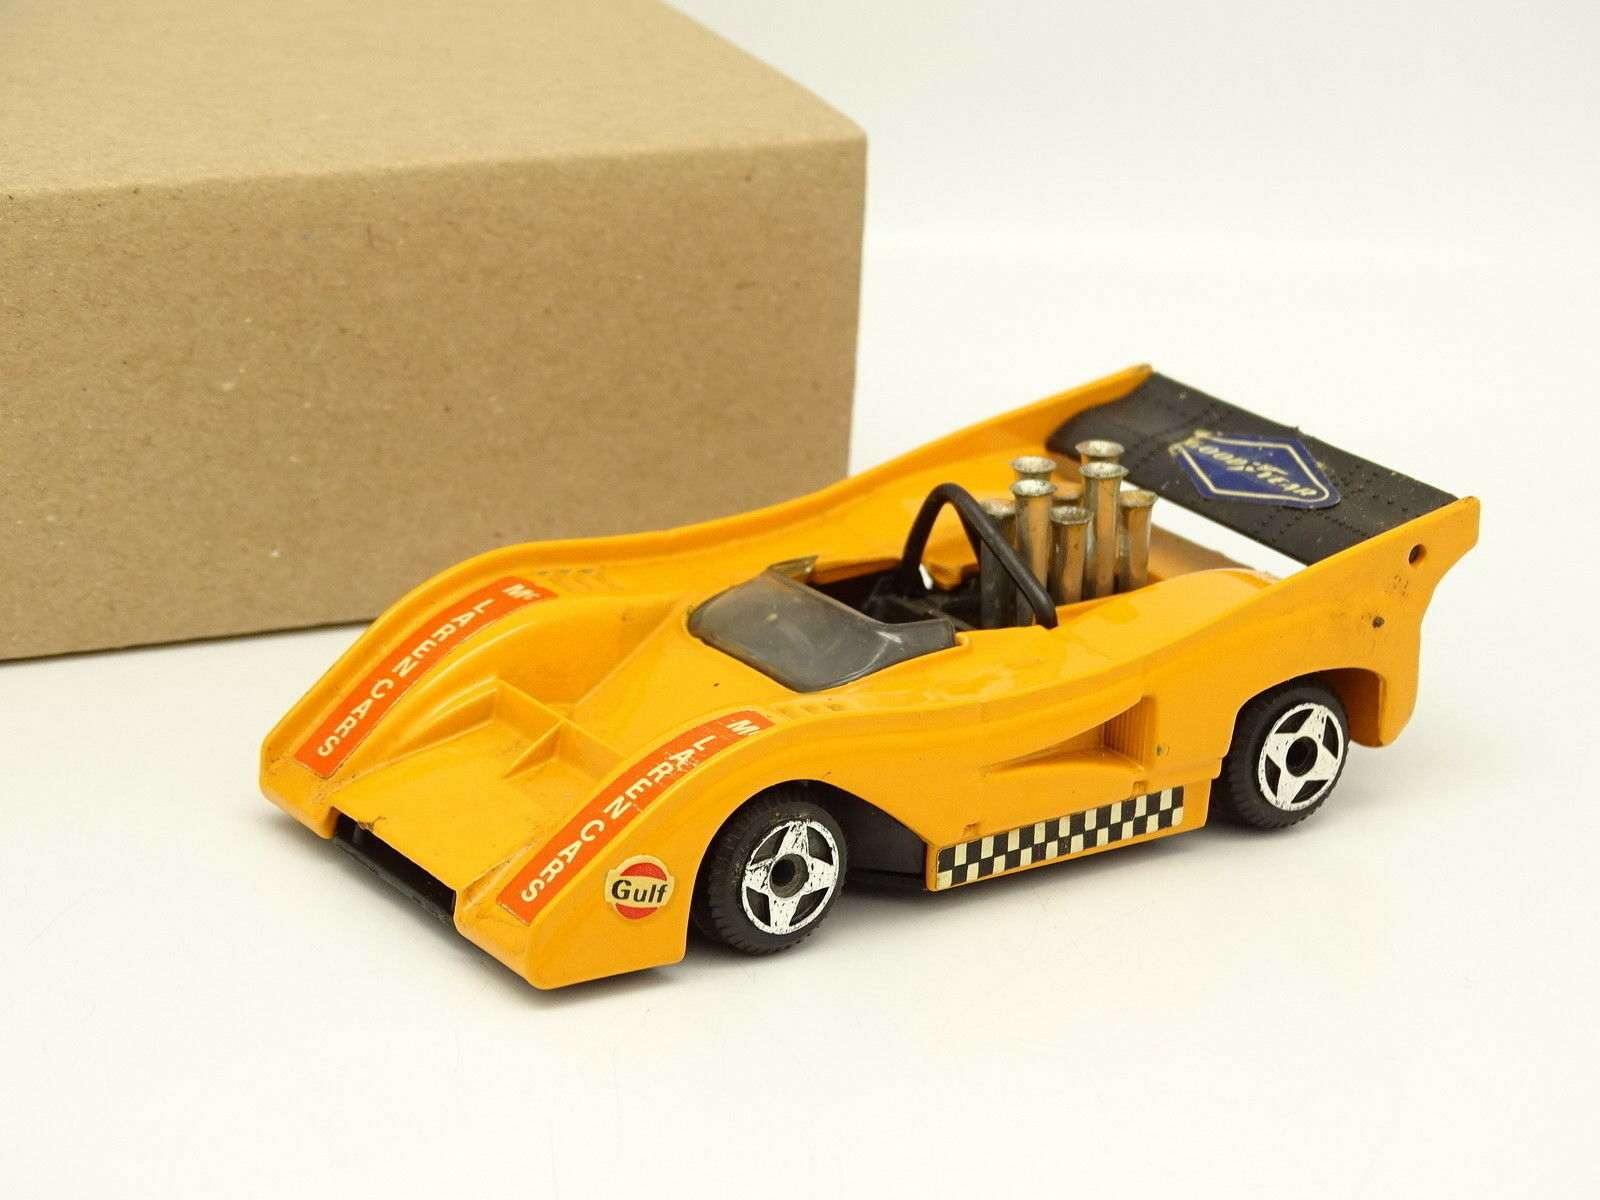 Politoys 1 43 - McLaren Chevrolet M8F Can Am